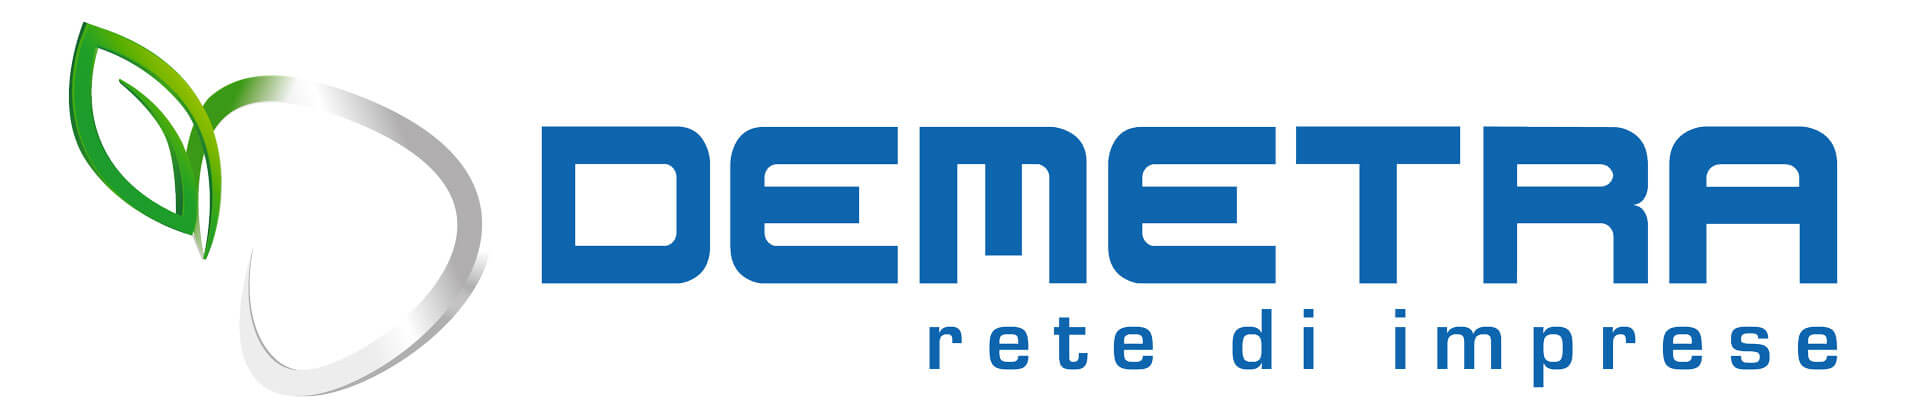 Rete Demetra - Logomarchio Torino